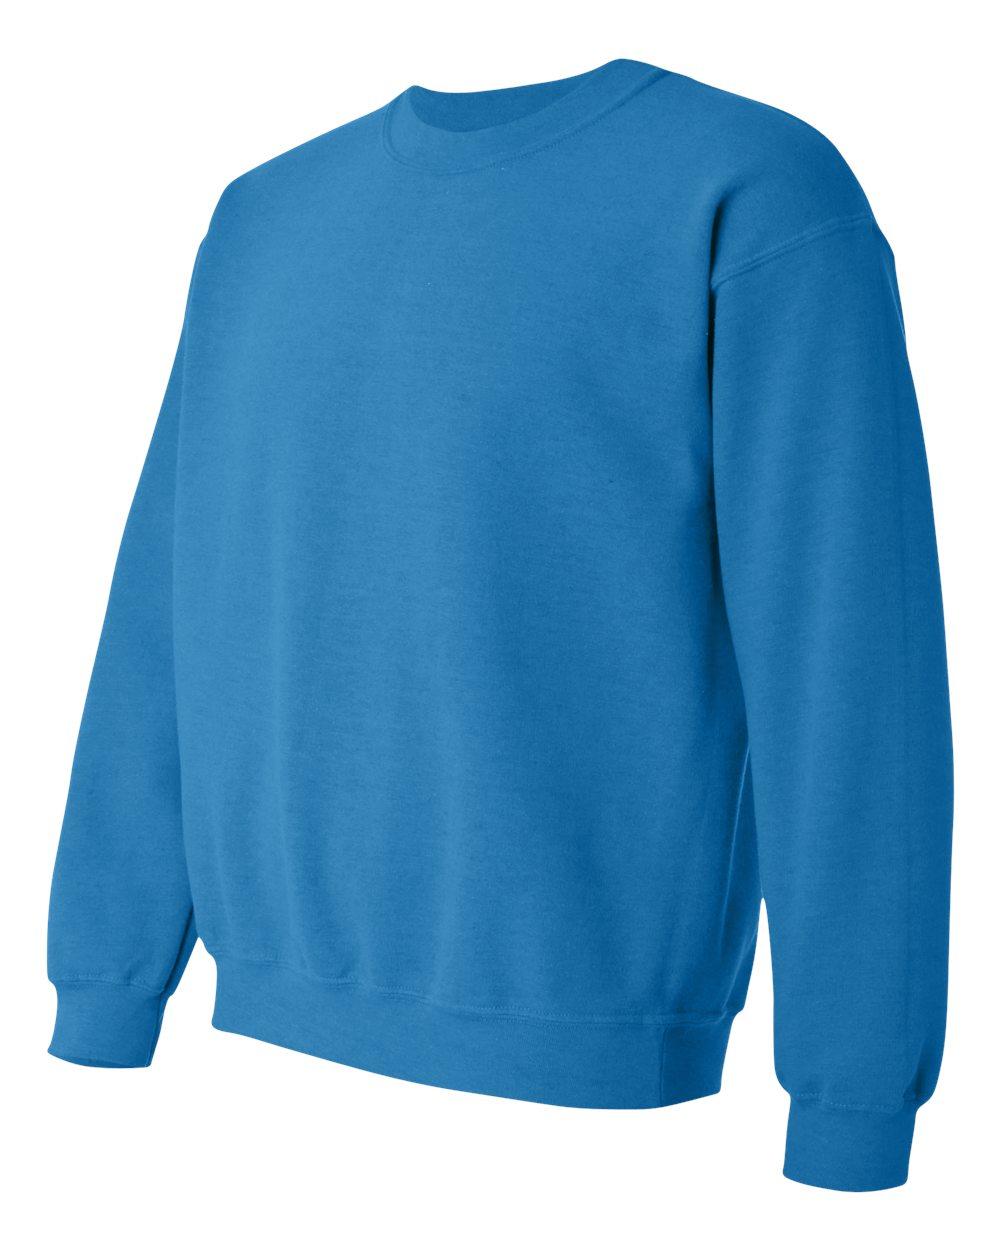 Gildan Heavy Blend Crew Neck sweater GI18000 Antique Sapphire Blue